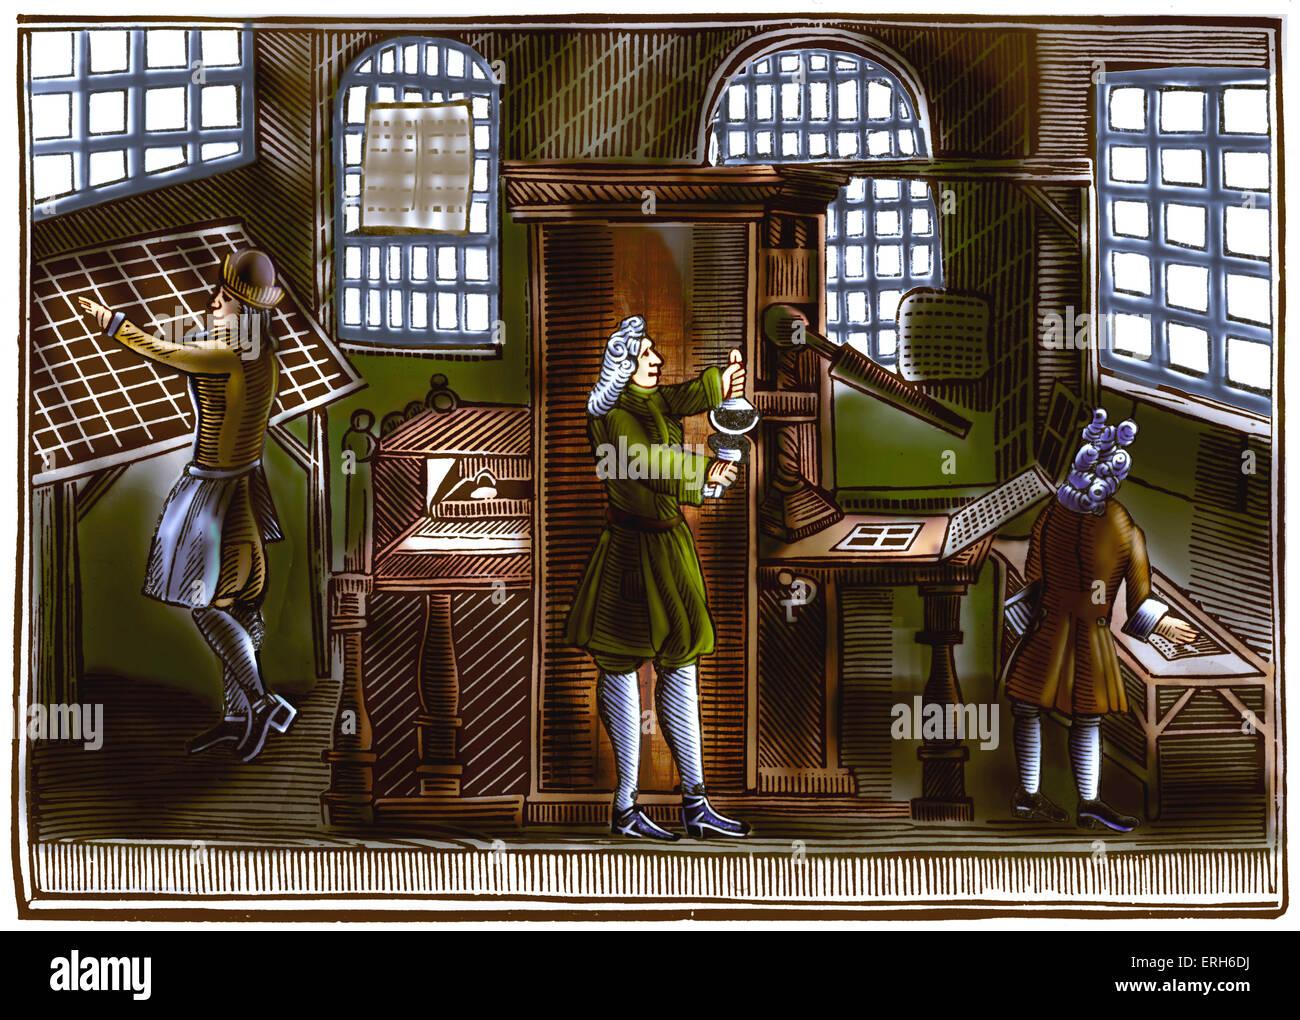 Printing office, c 1710. Engraving demonstrates early printing methods. - Stock Image